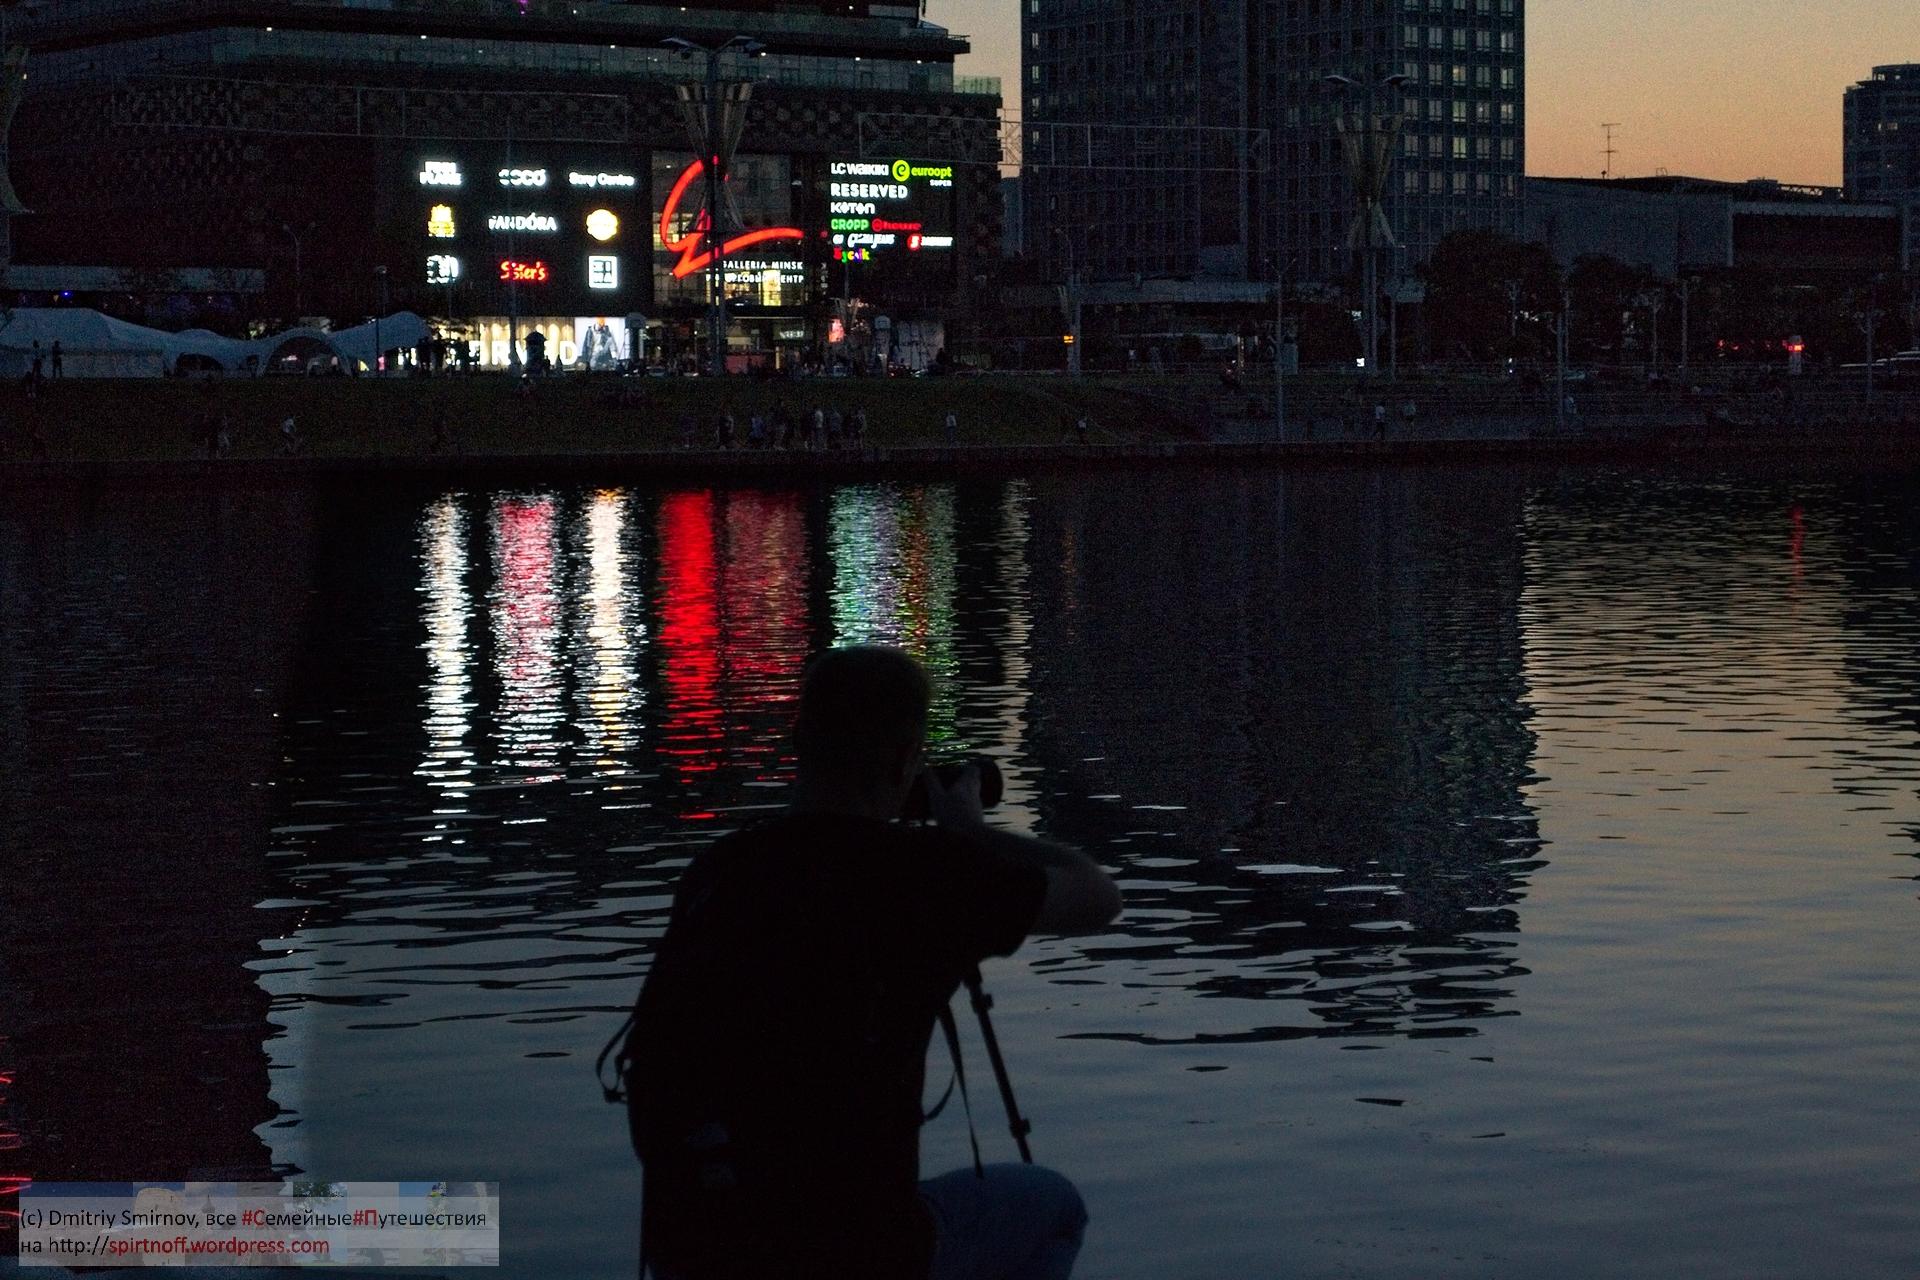 DSC_7286-22-Blog-64 Путешествия  Минск. Закат и город